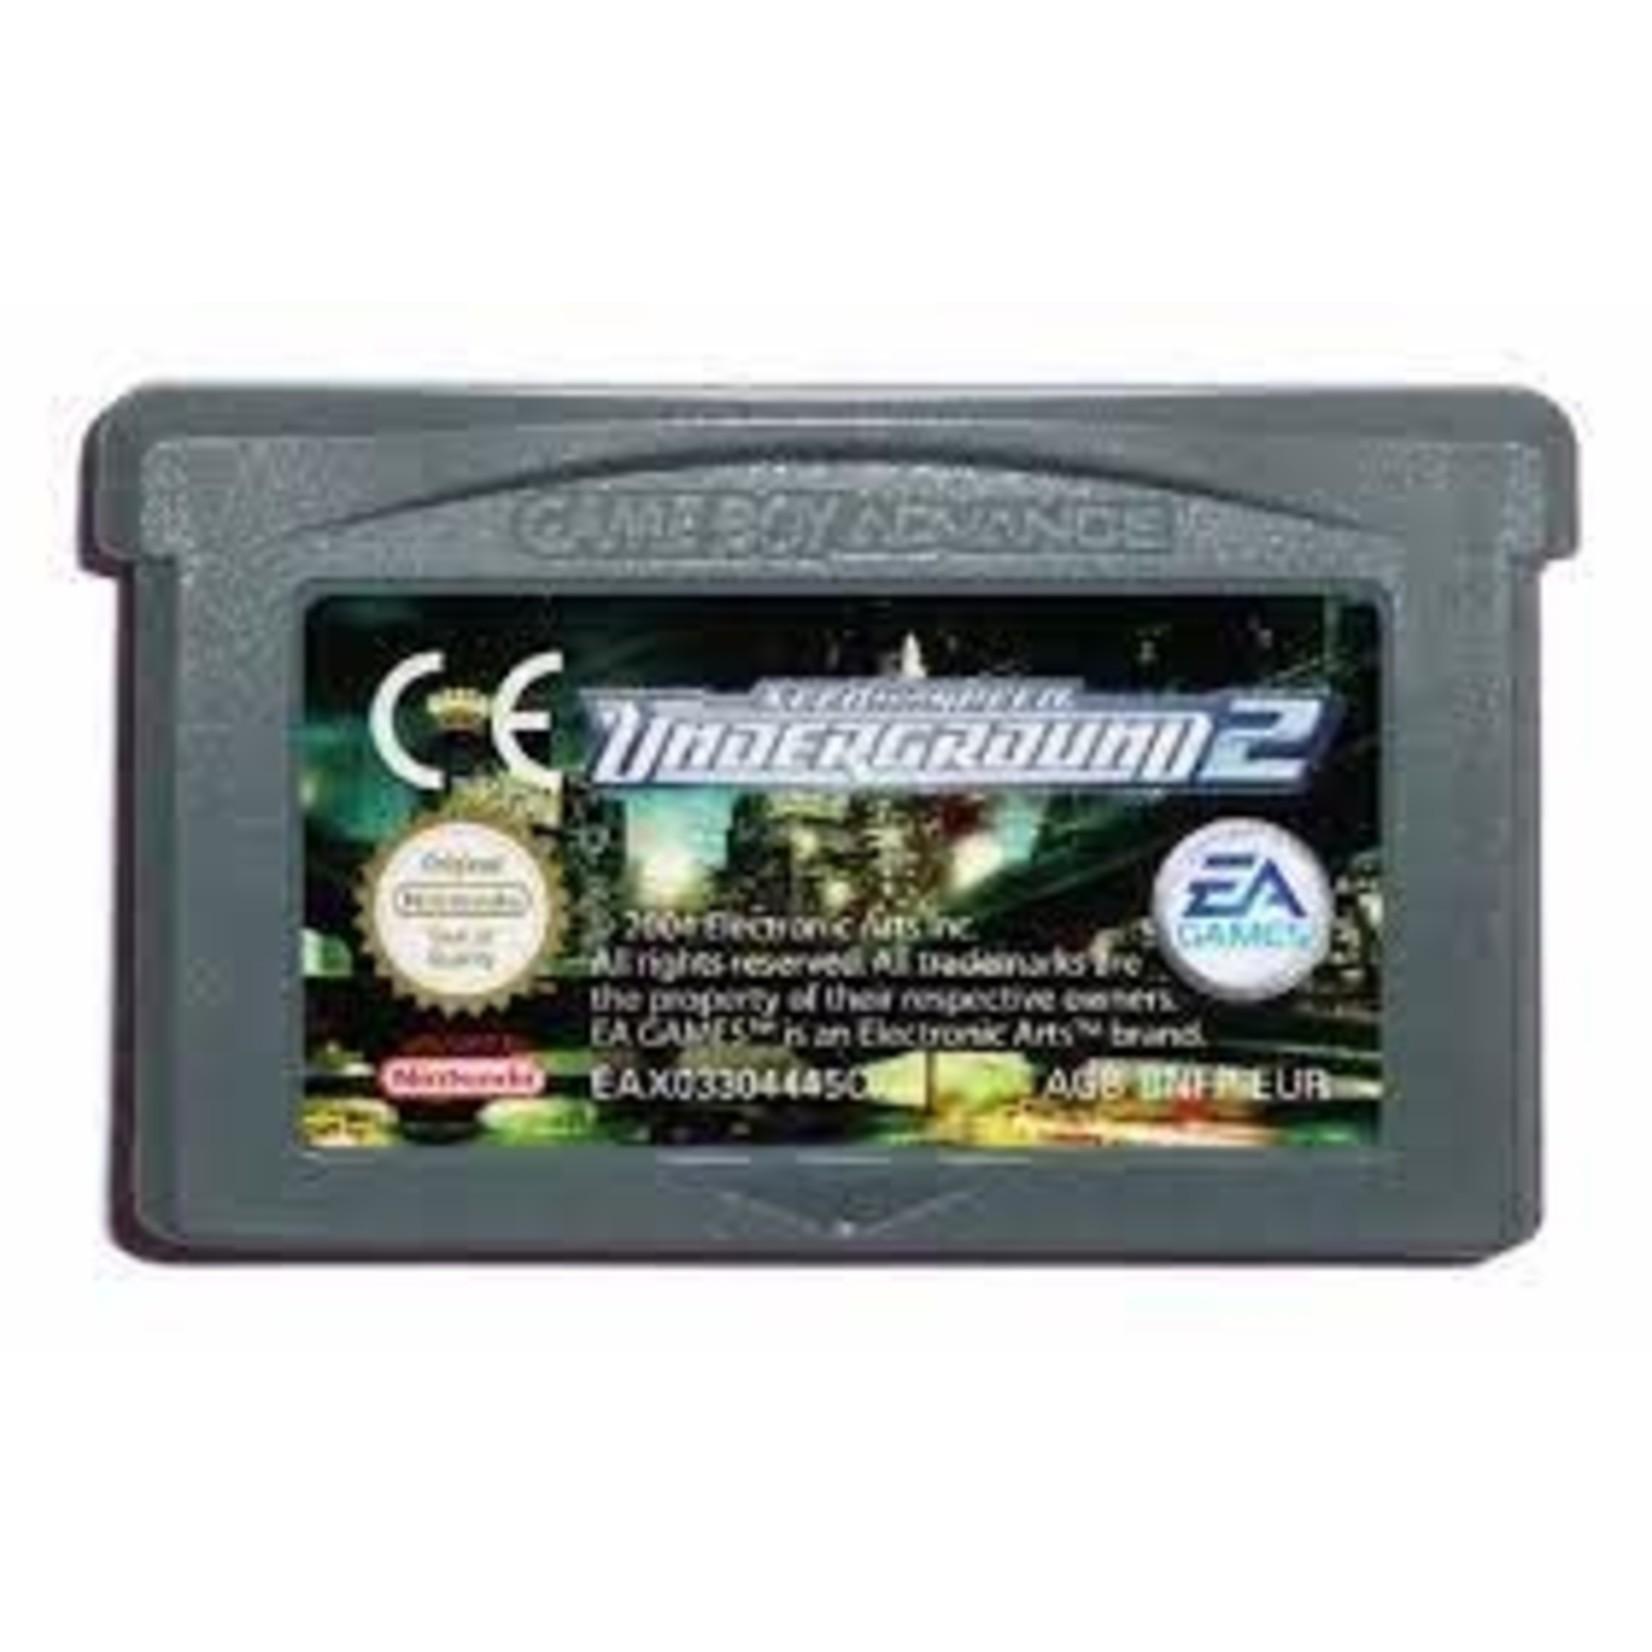 gbau-Need for Speed Underground 2 (cartridge)